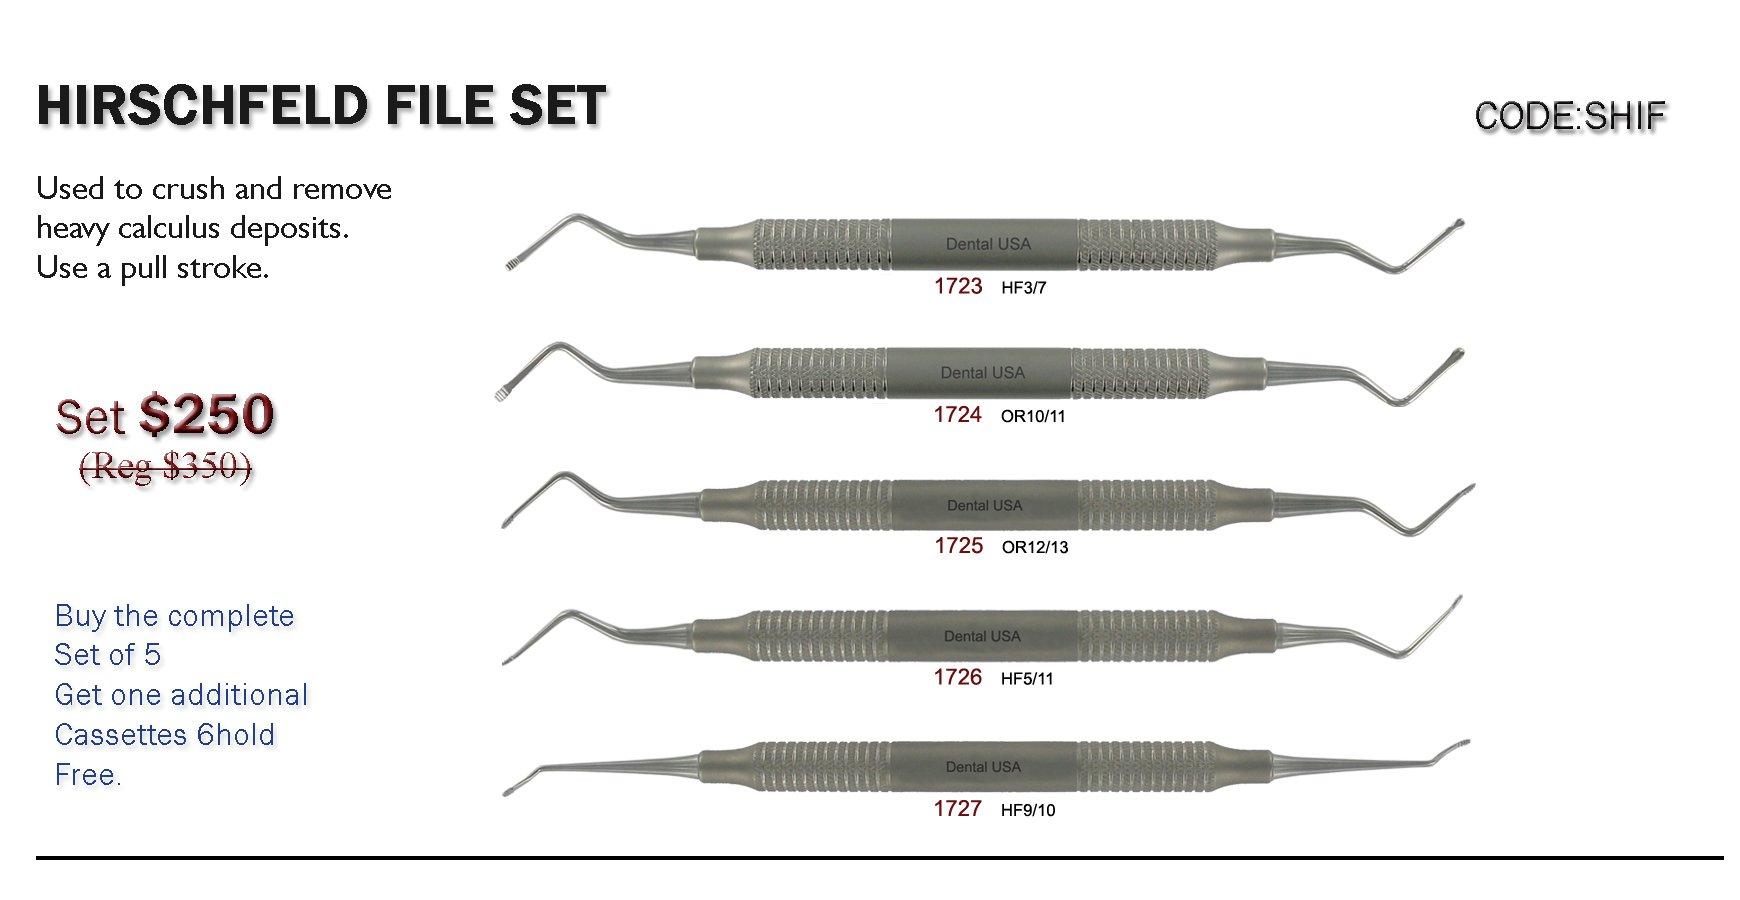 Dental USA-Hirschfeld File Set Code-SHIF